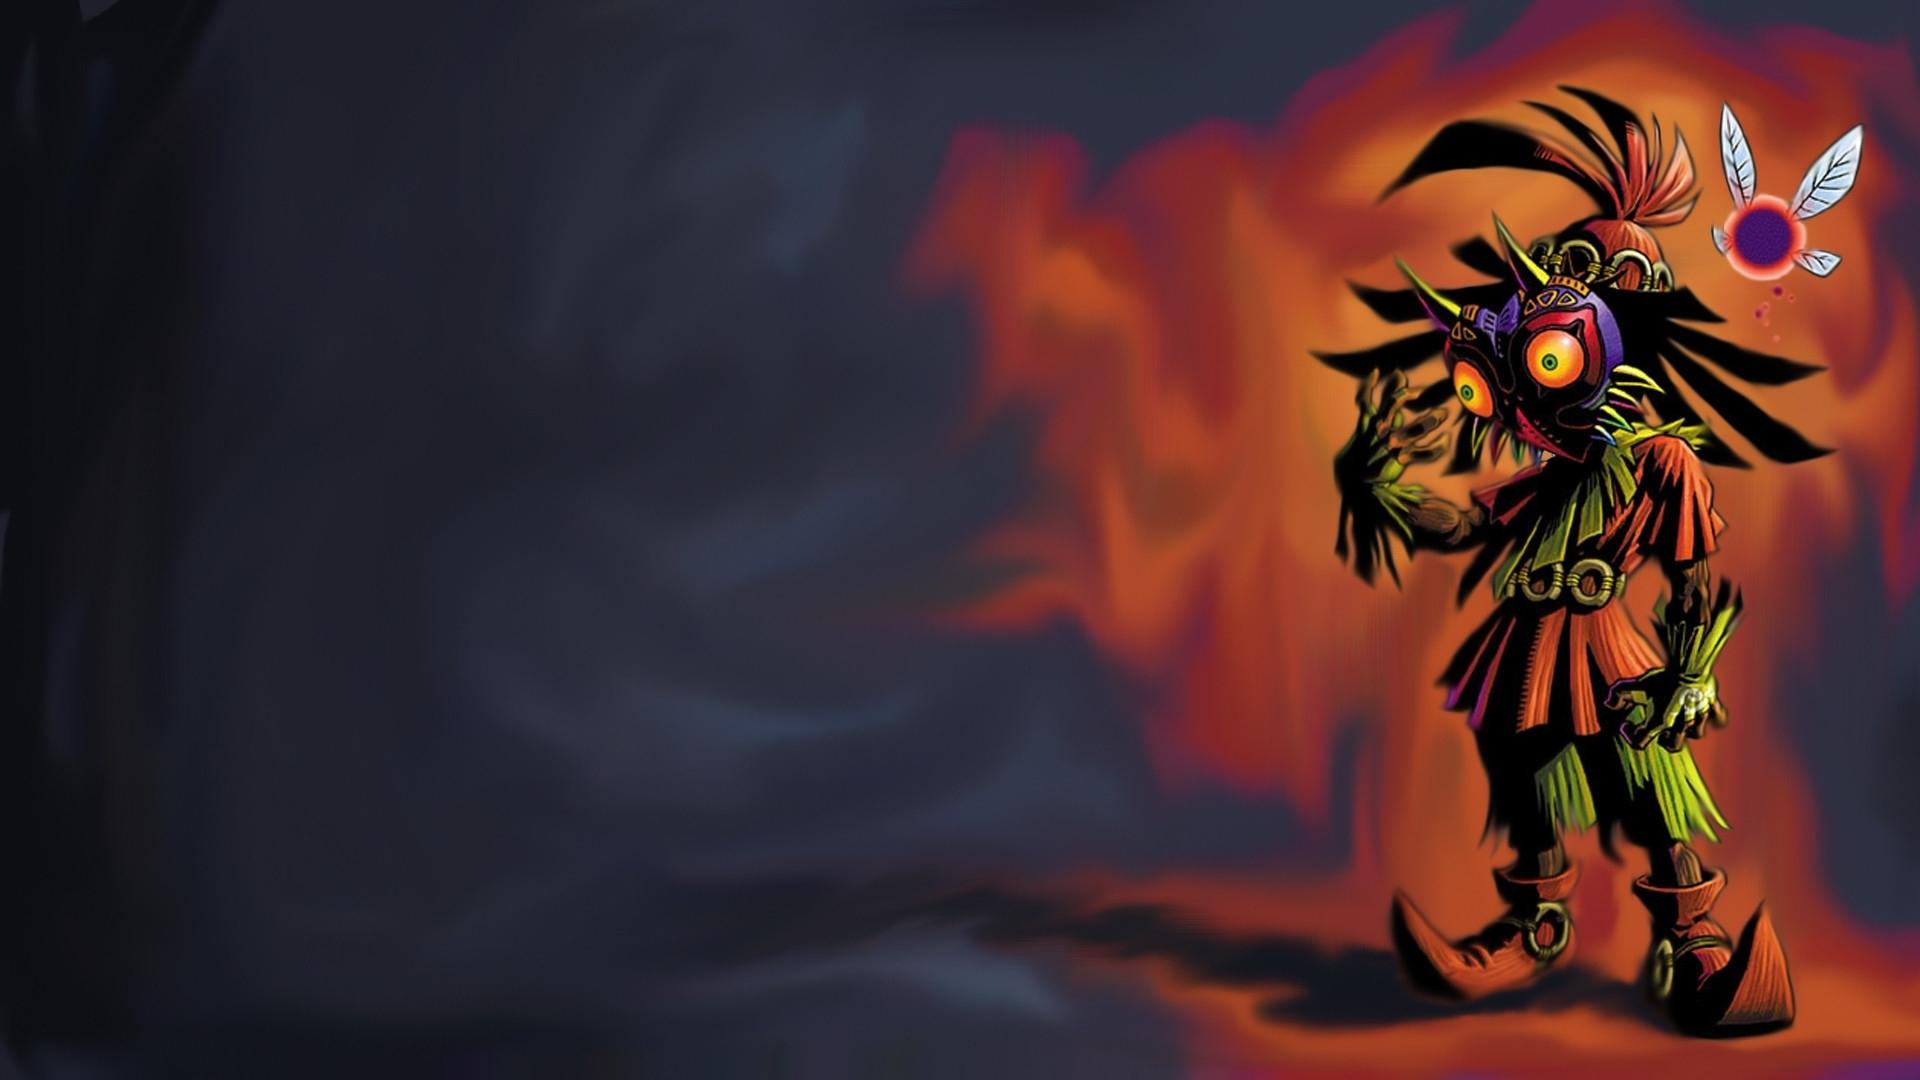 the legend of zelda: majora's mask full hd wallpaper and background